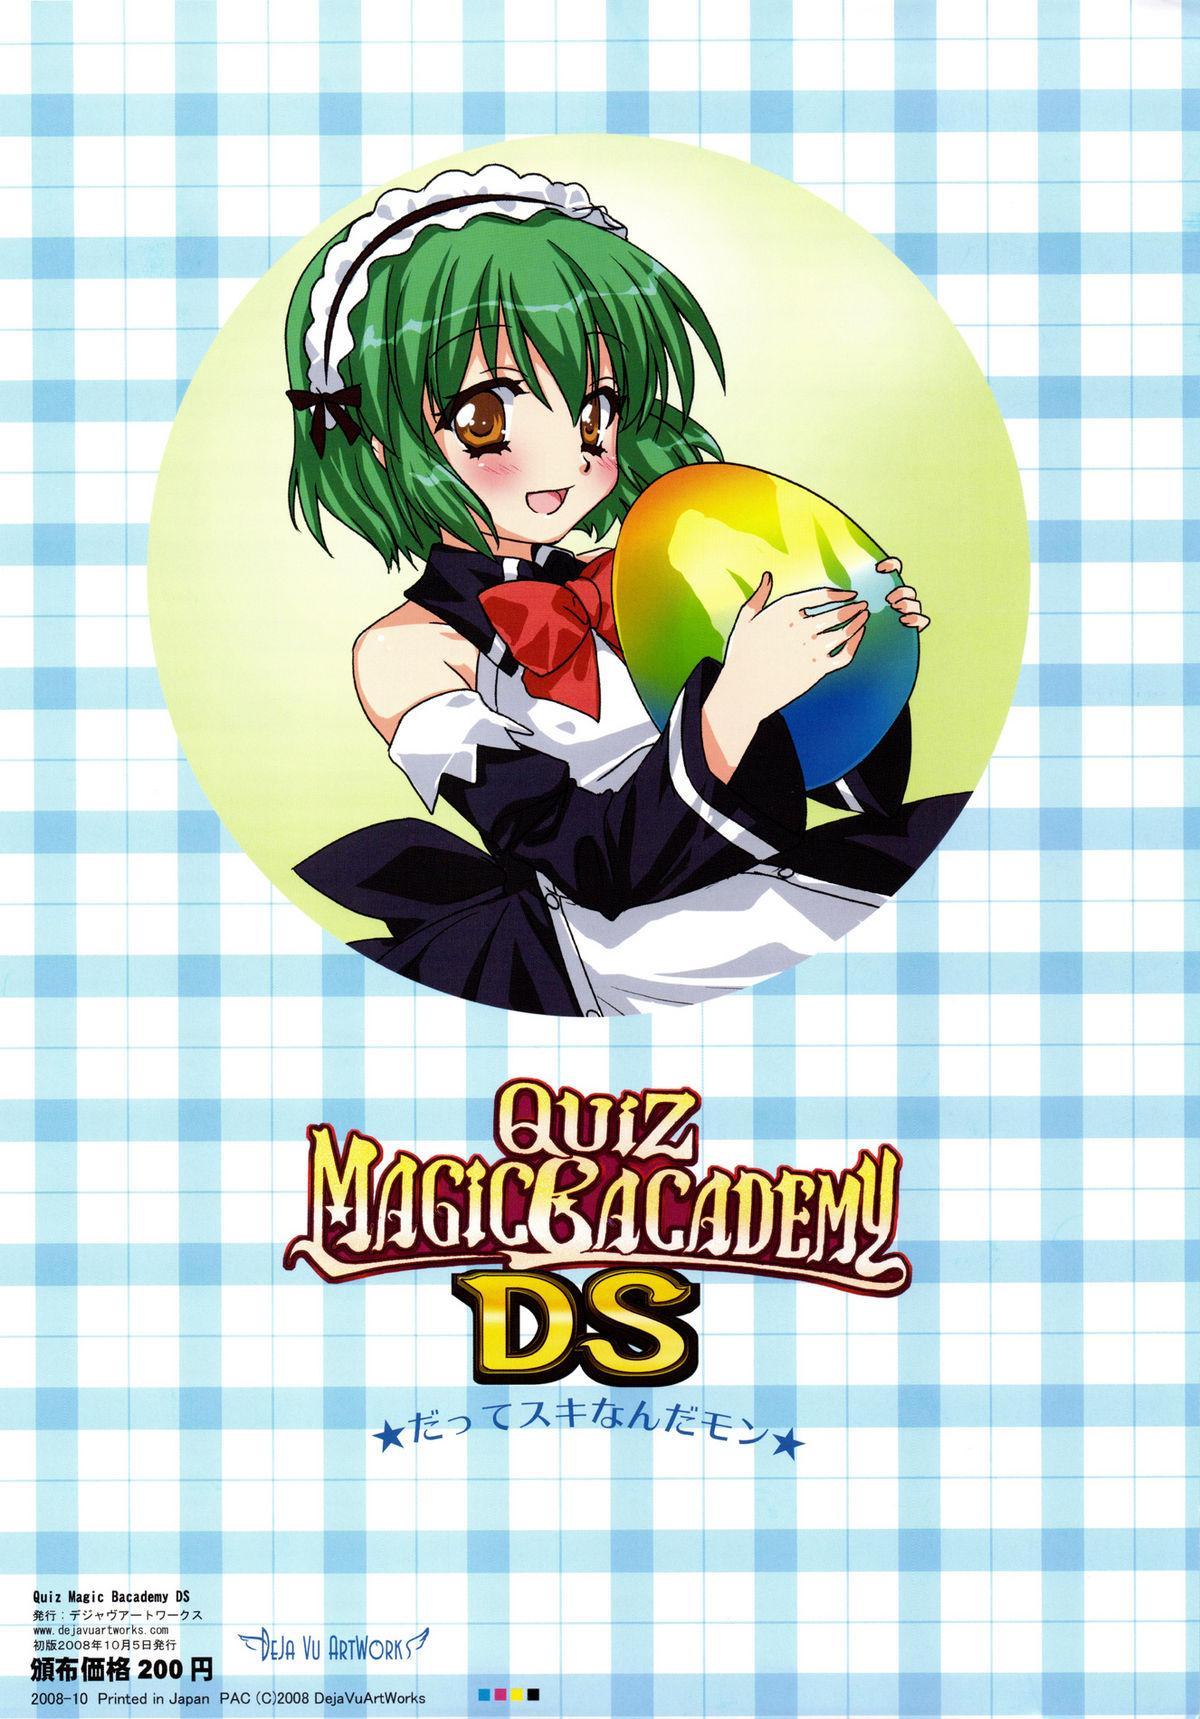 QUIZ MAGIC BACADEMY DS 7